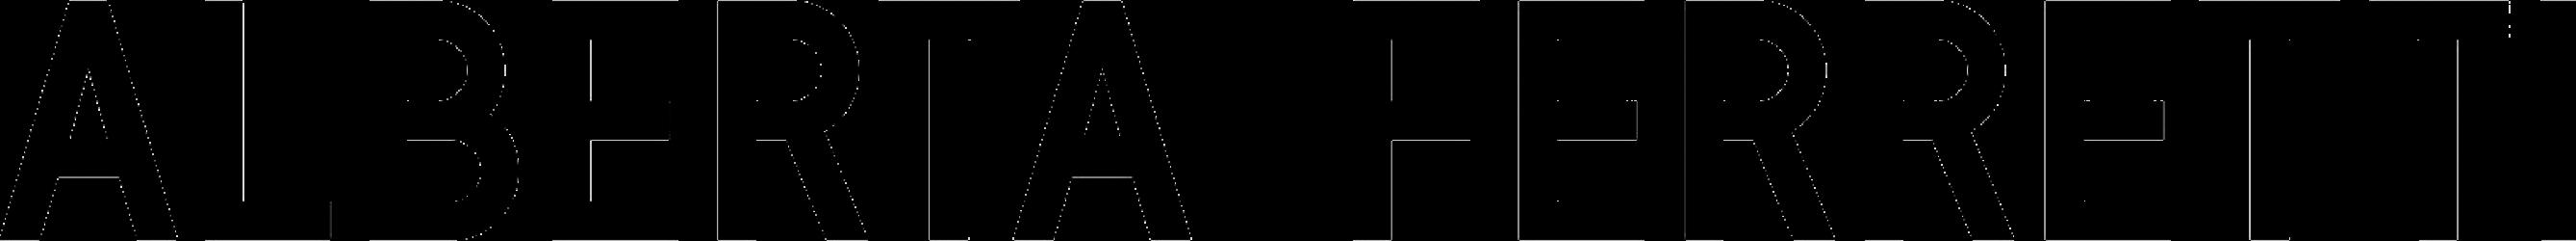 latest alberta ferretti logo